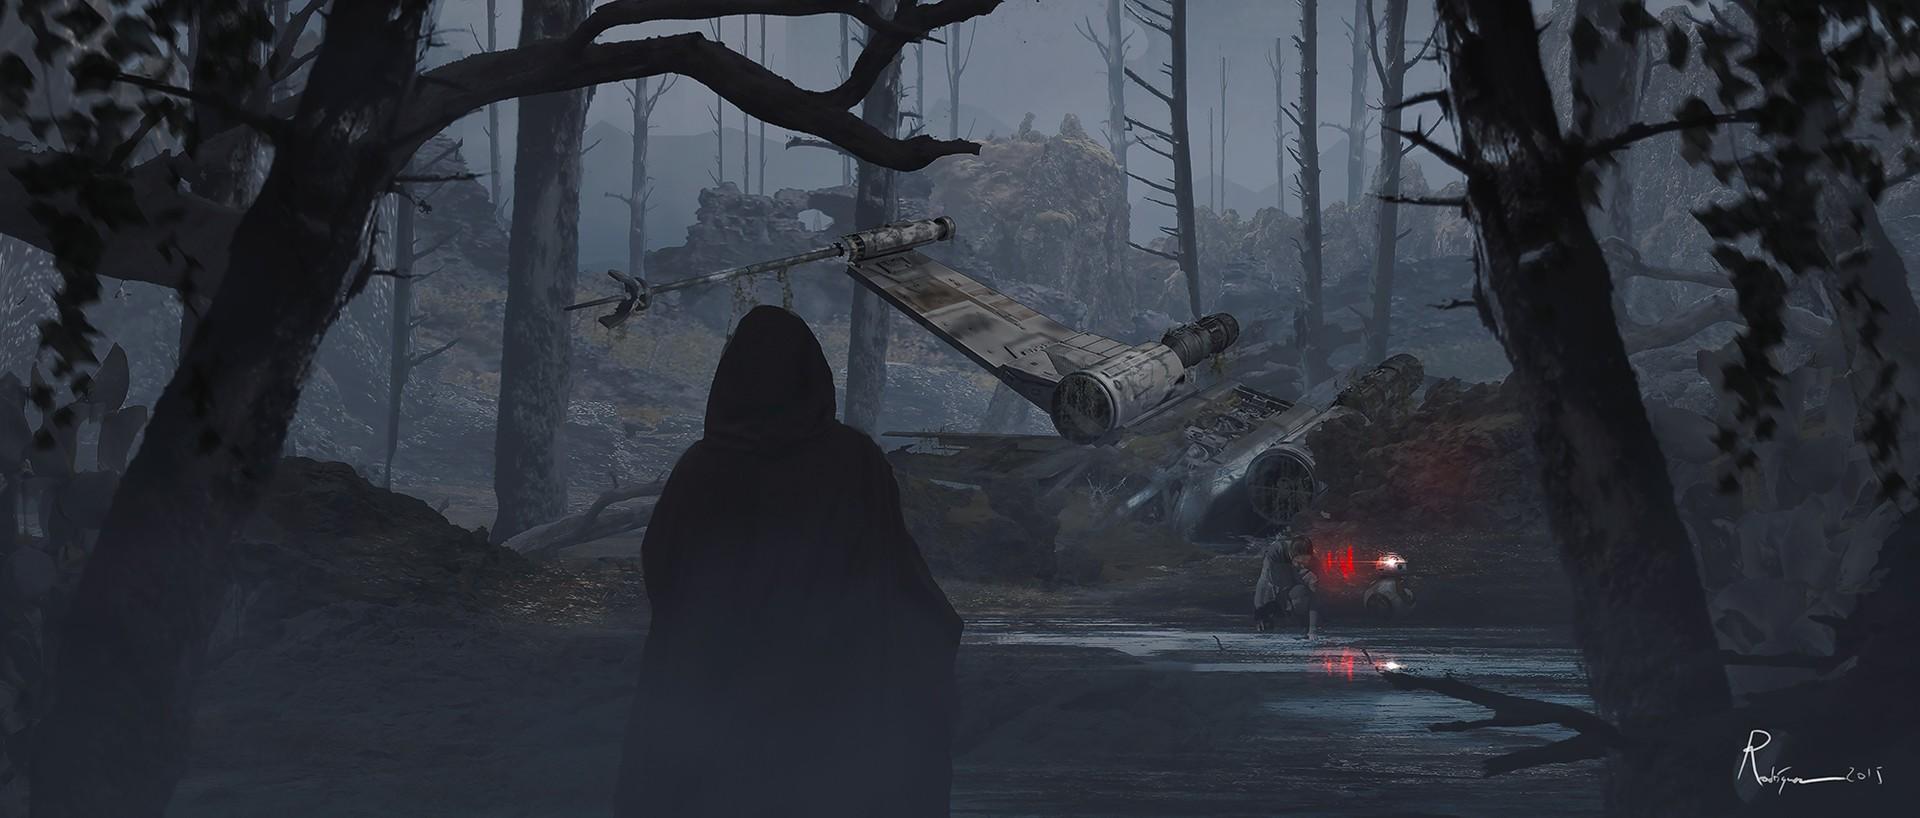 Forest Star Wars The Force Awakens X Wing BB 8 Darkness Screenshot Habitat Natural